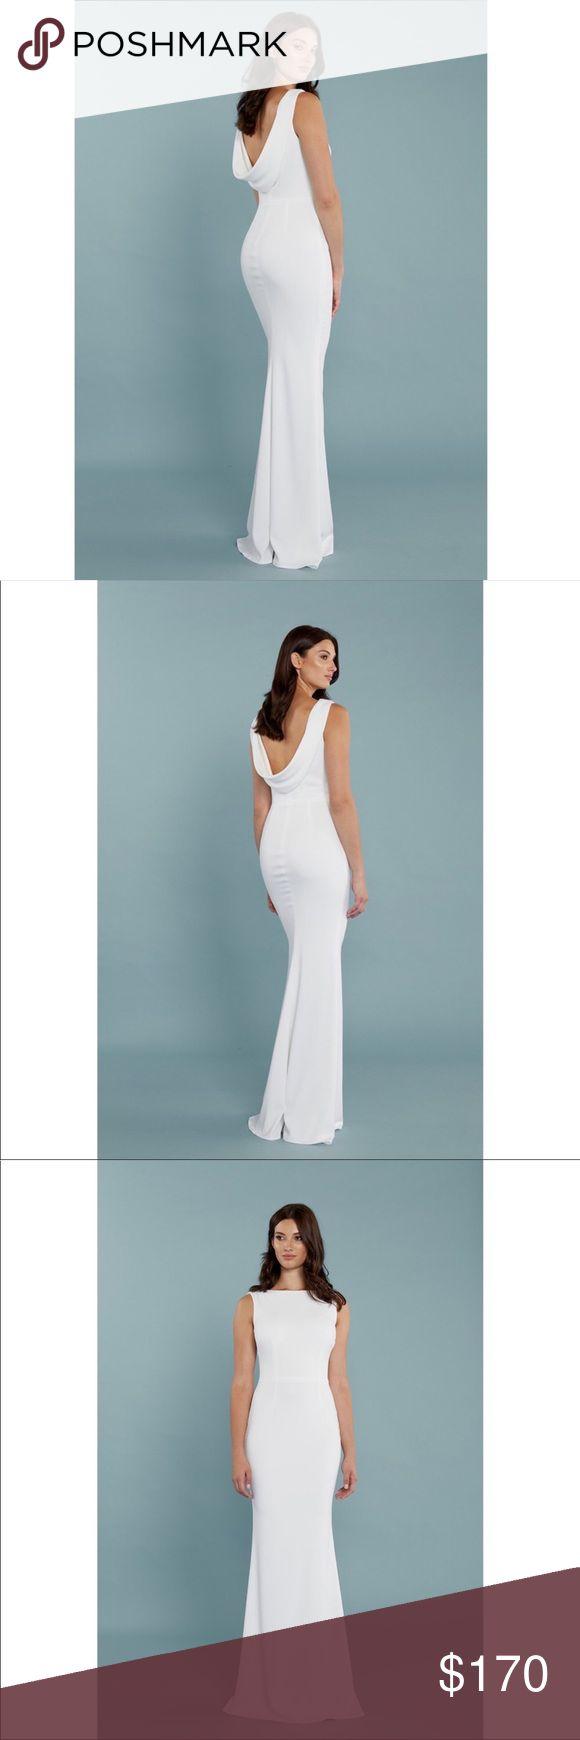 I just added this listing on Poshmark: NWT Katie May ivory Vionnet dress. #shopmycloset #poshmark #fashion #shopping #style #forsale #katie may #Dresses & Skirts